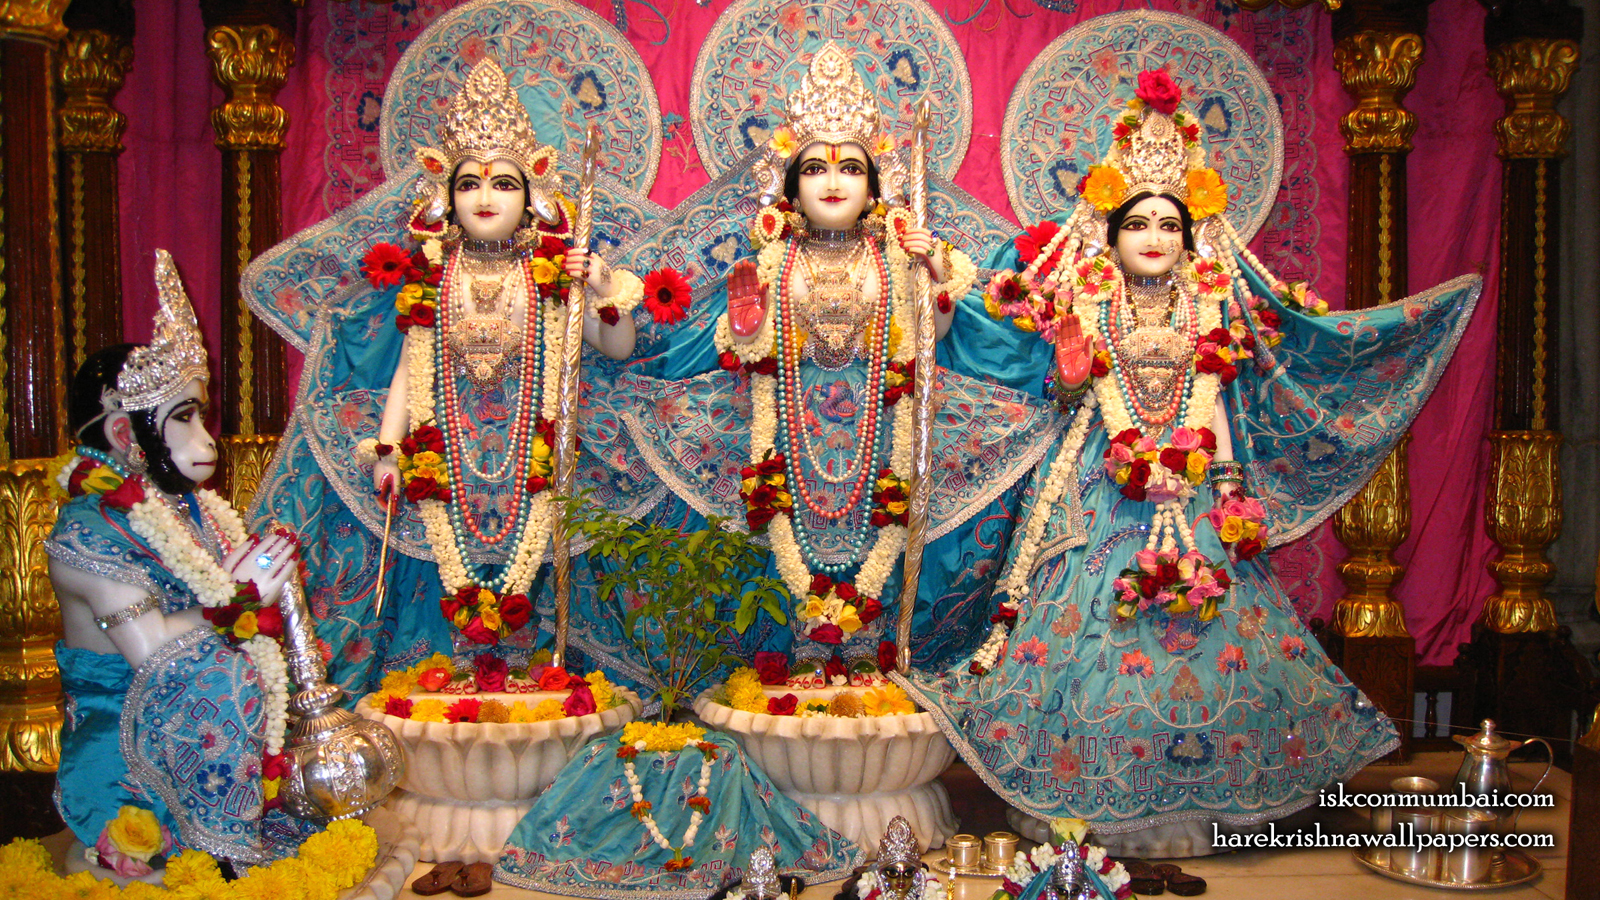 Sri Sri Sita Rama Laxman Hanuman Wallpaper (005) Size 1600x900 Download